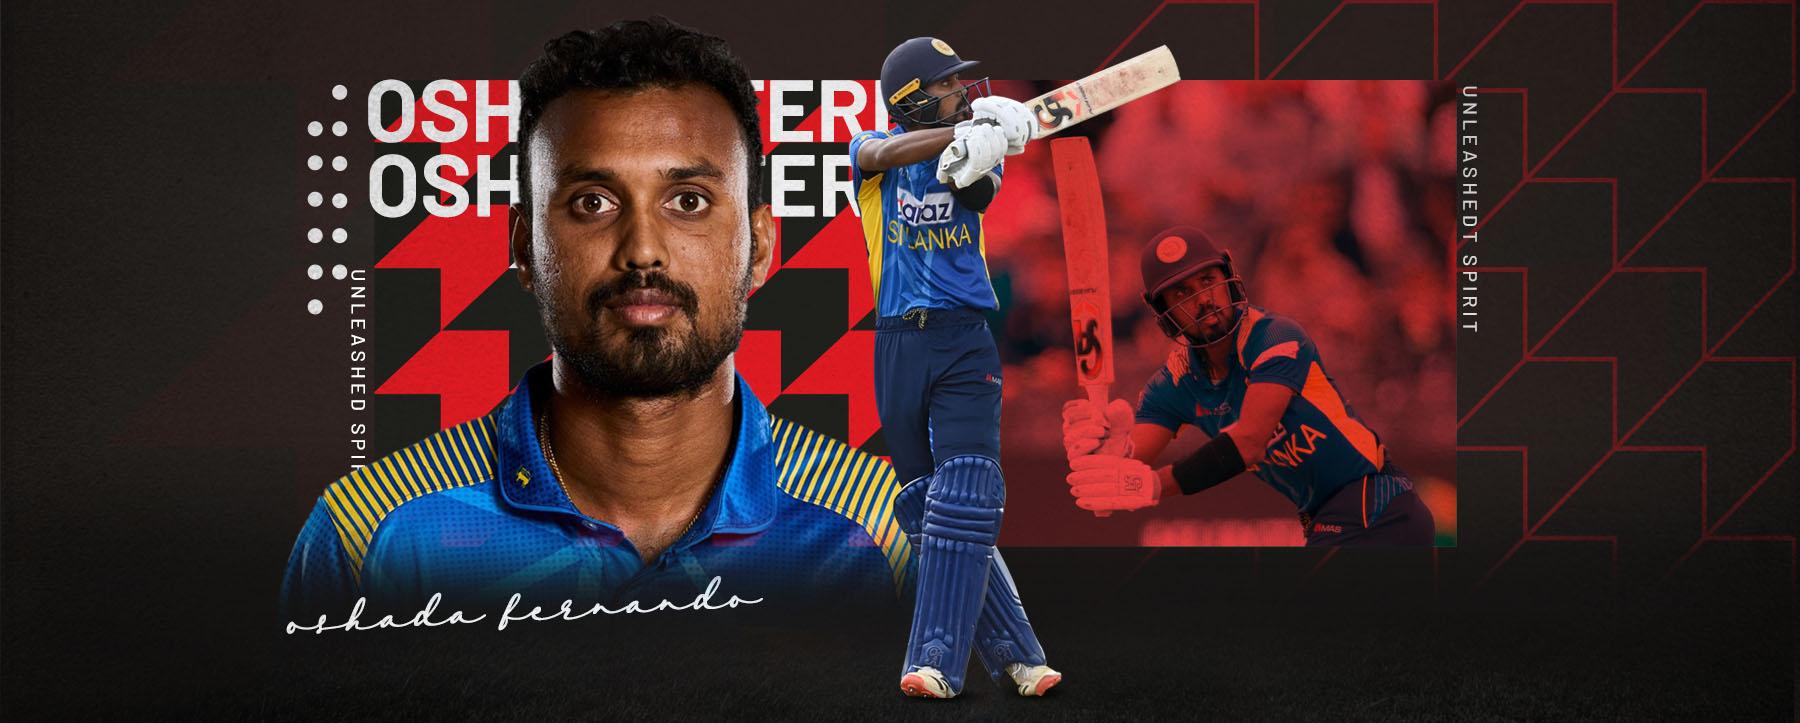 oshada Fernando Sri lankan Cricket